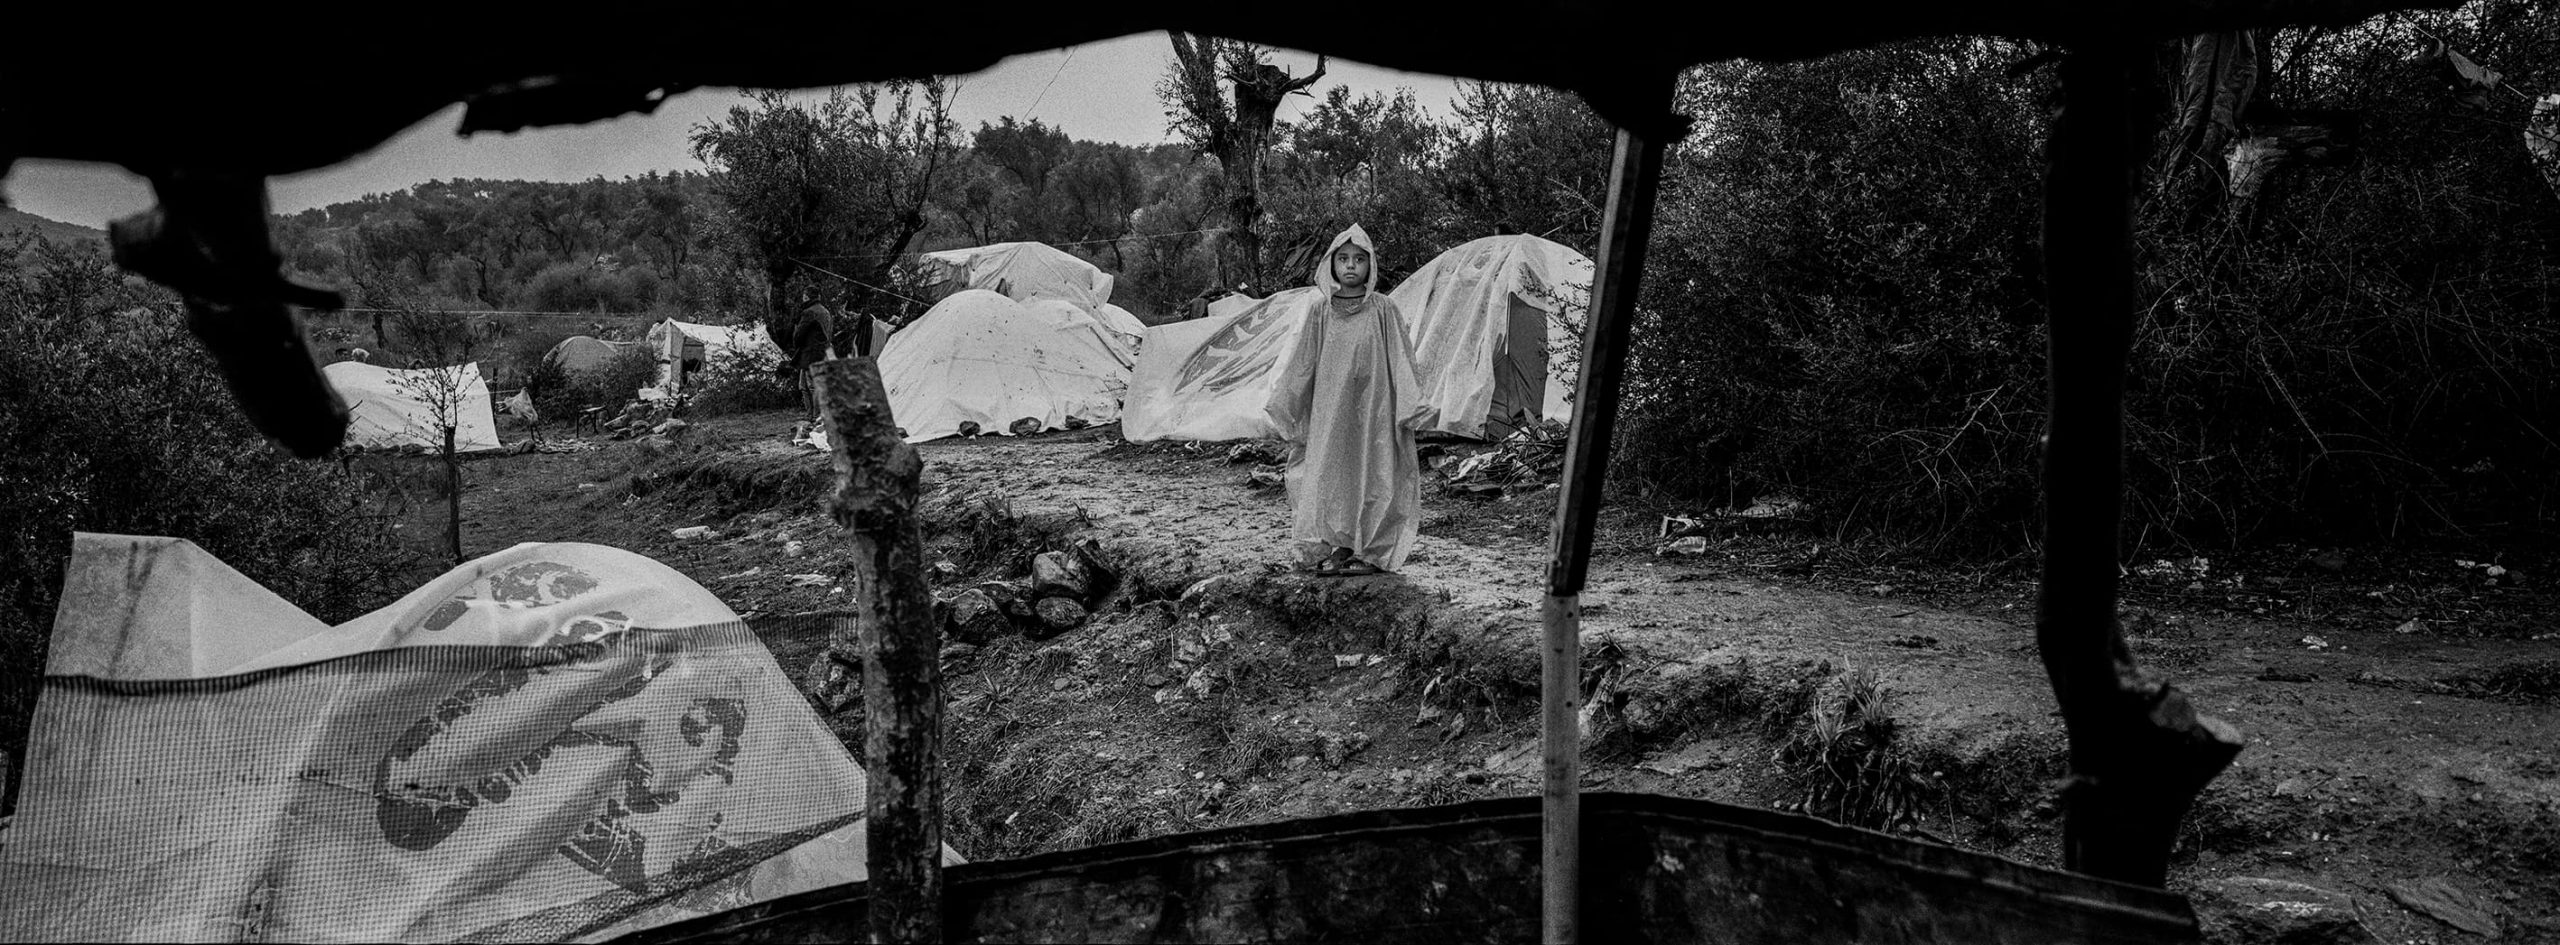 Athens Photo World 2021 | βραβεία